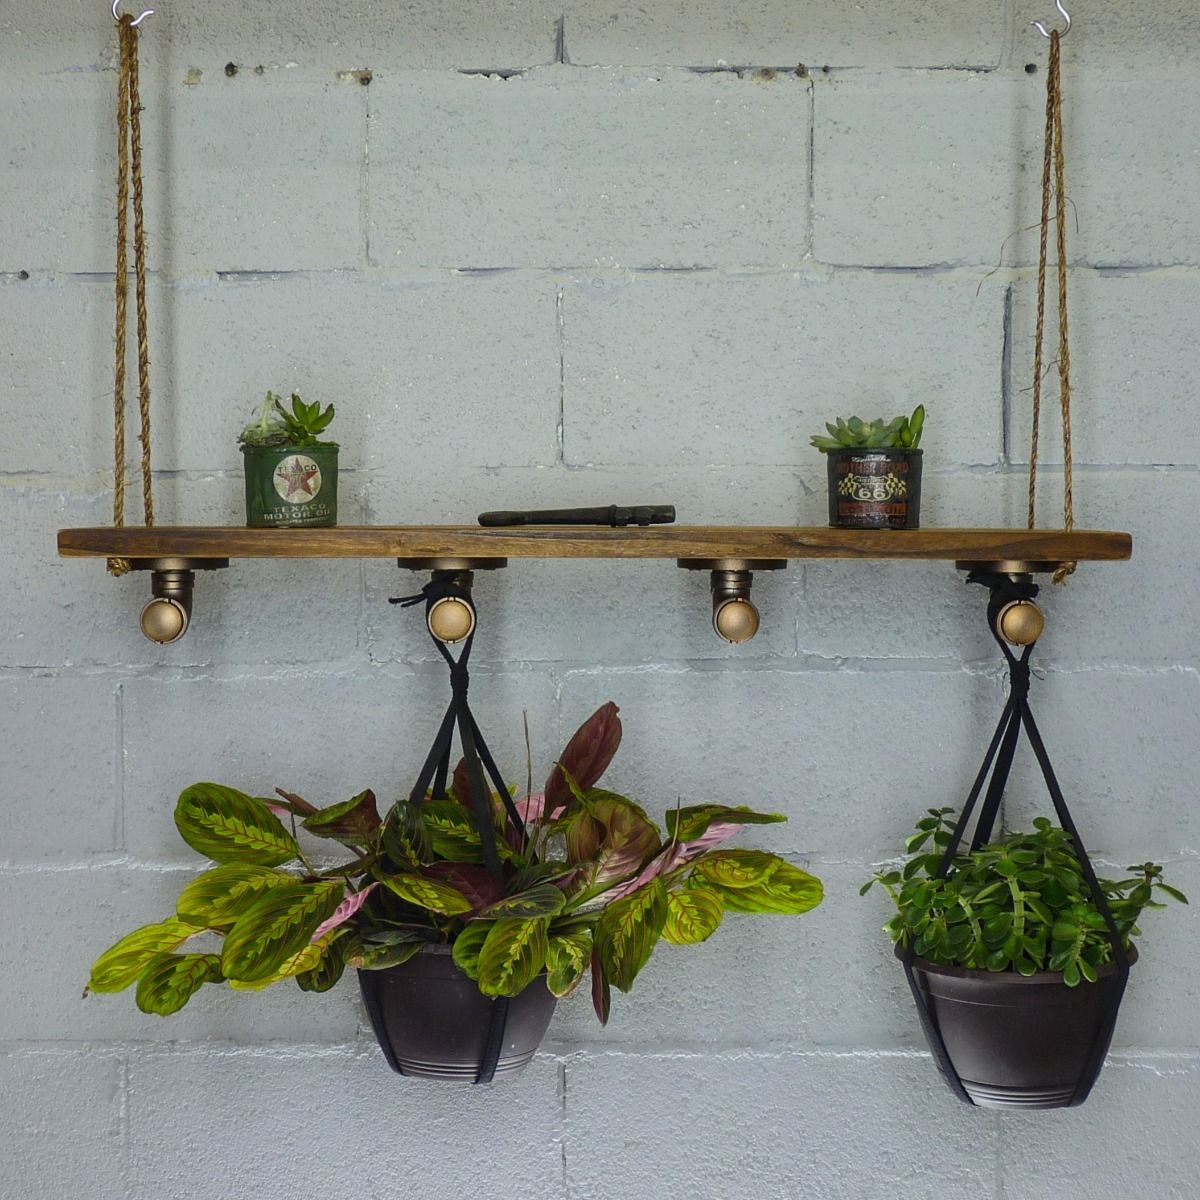 Chic Hanging Shelf Planter